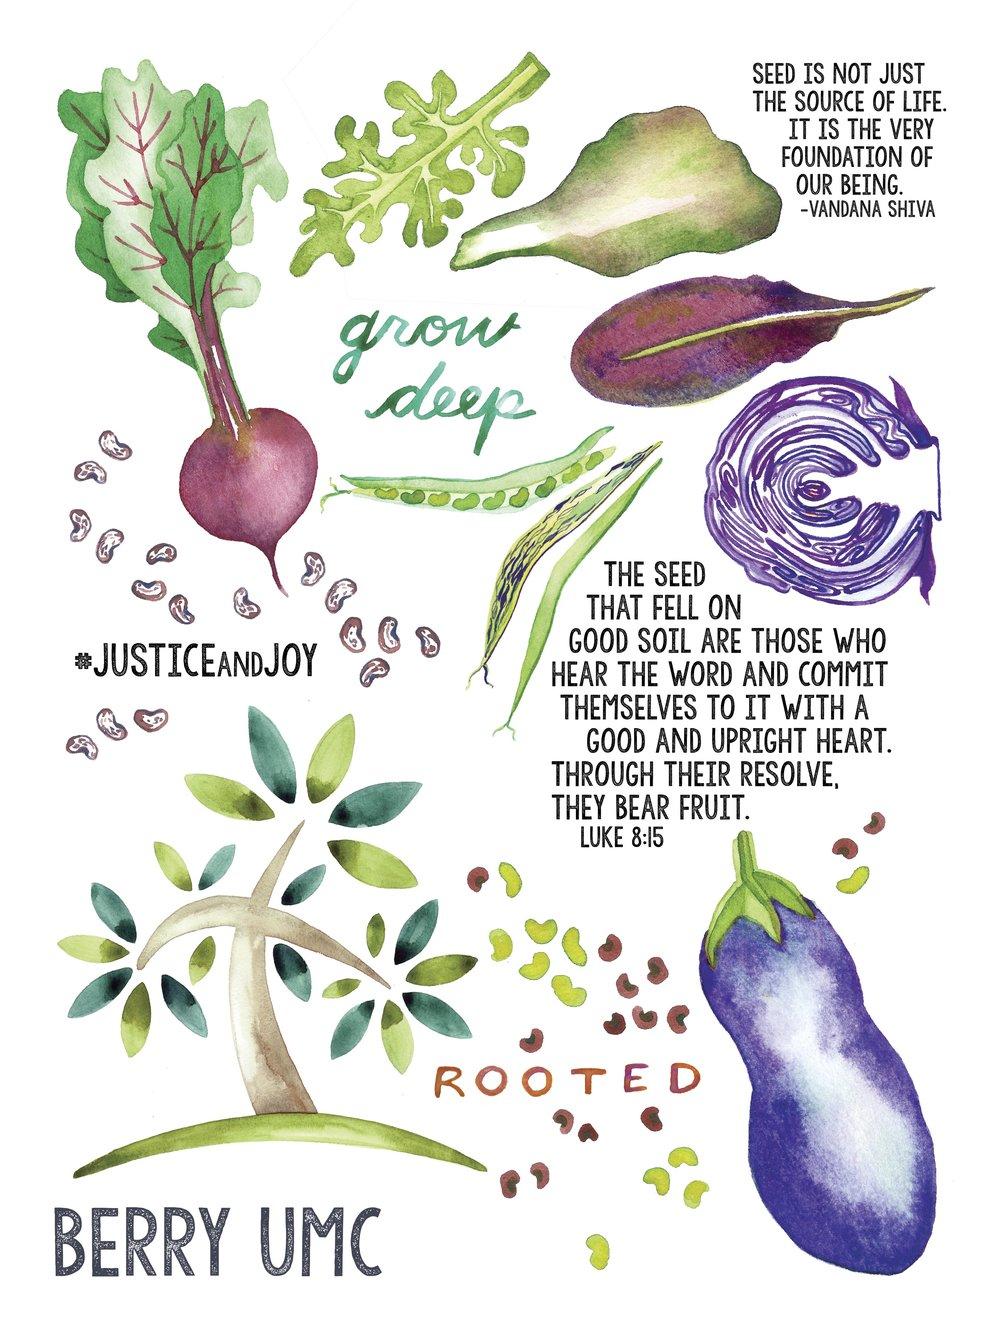 Berry United Methodist Church  - Brunch Church Poster Artwork & Design